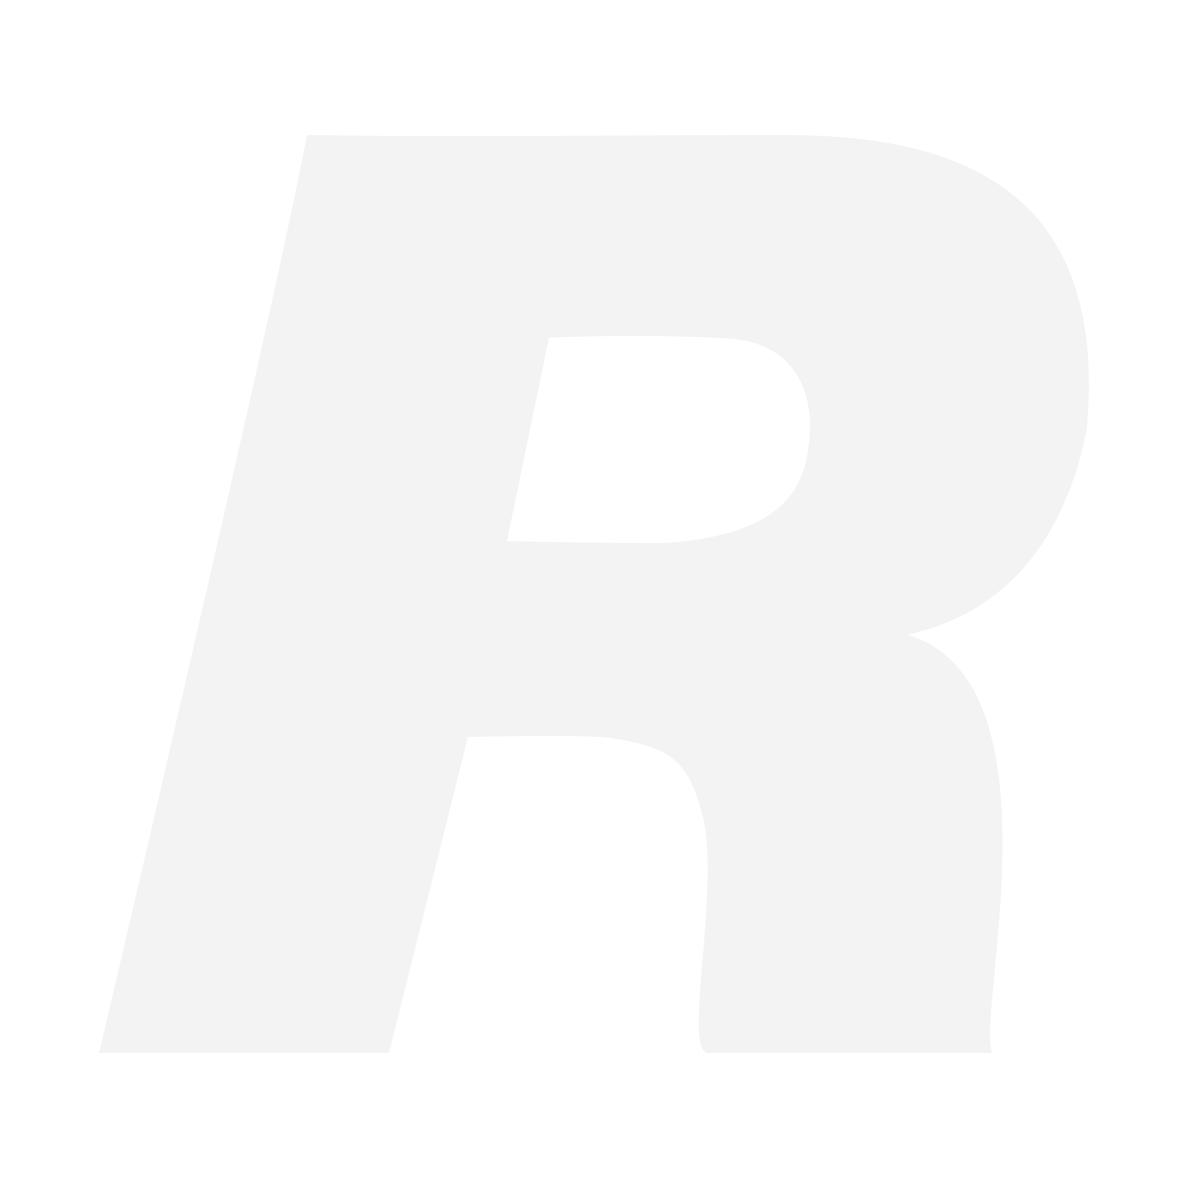 Osta Sony A7R Mark II, anna vaihdossa Canon EOS 6D Mark II